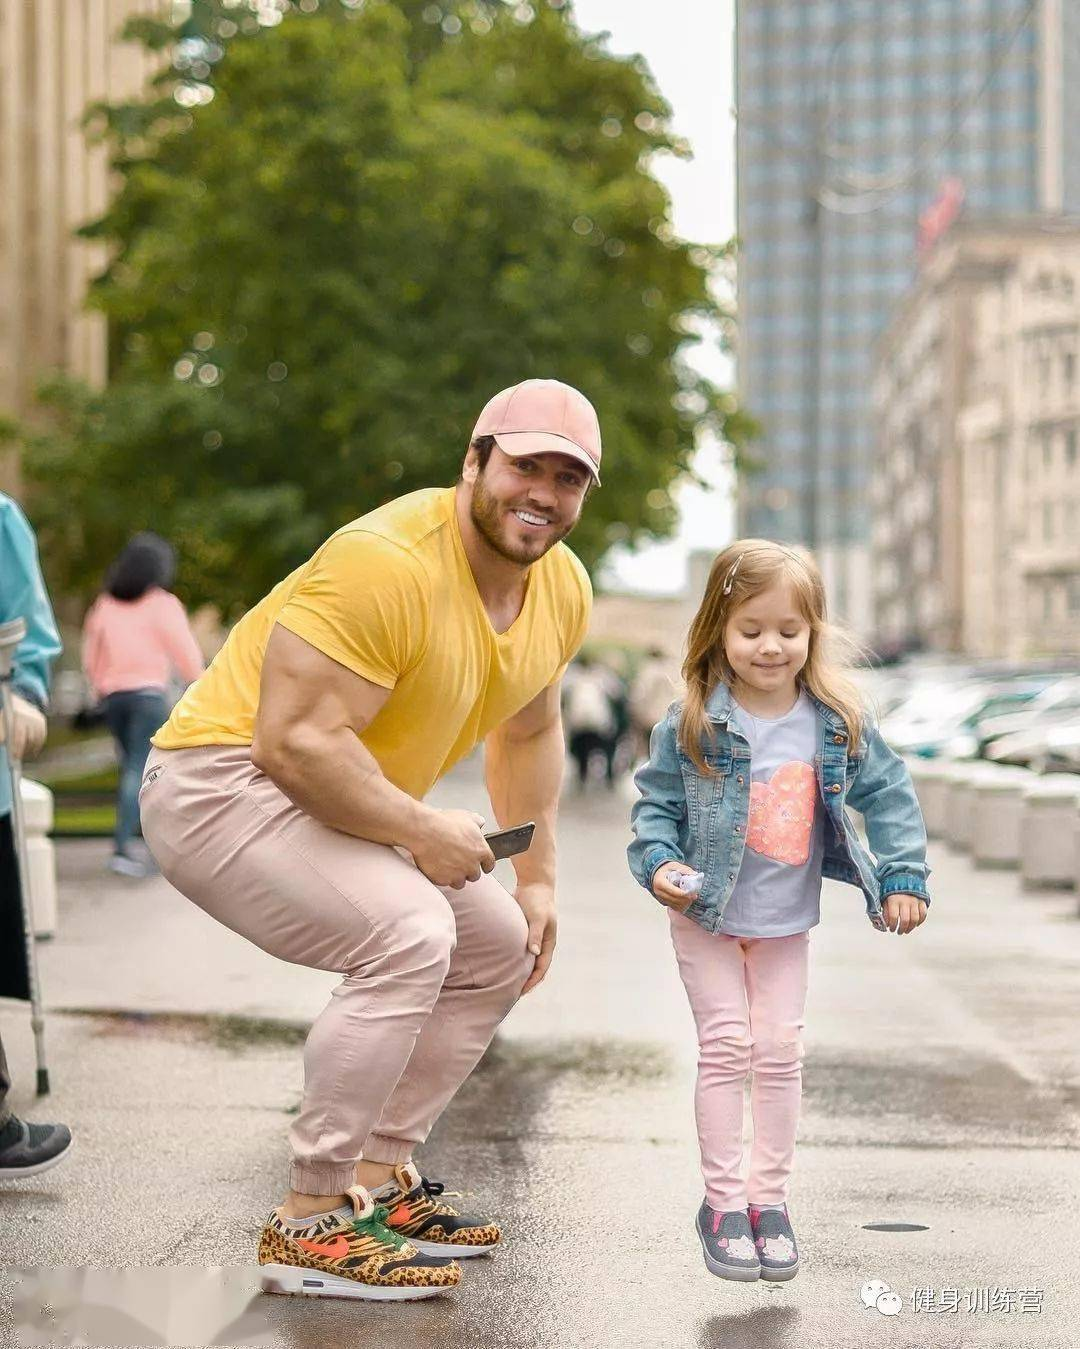 55cm臂围的肌肉硬汉,看了他的奶爸日常,我都想生娃了 初级健身 第22张